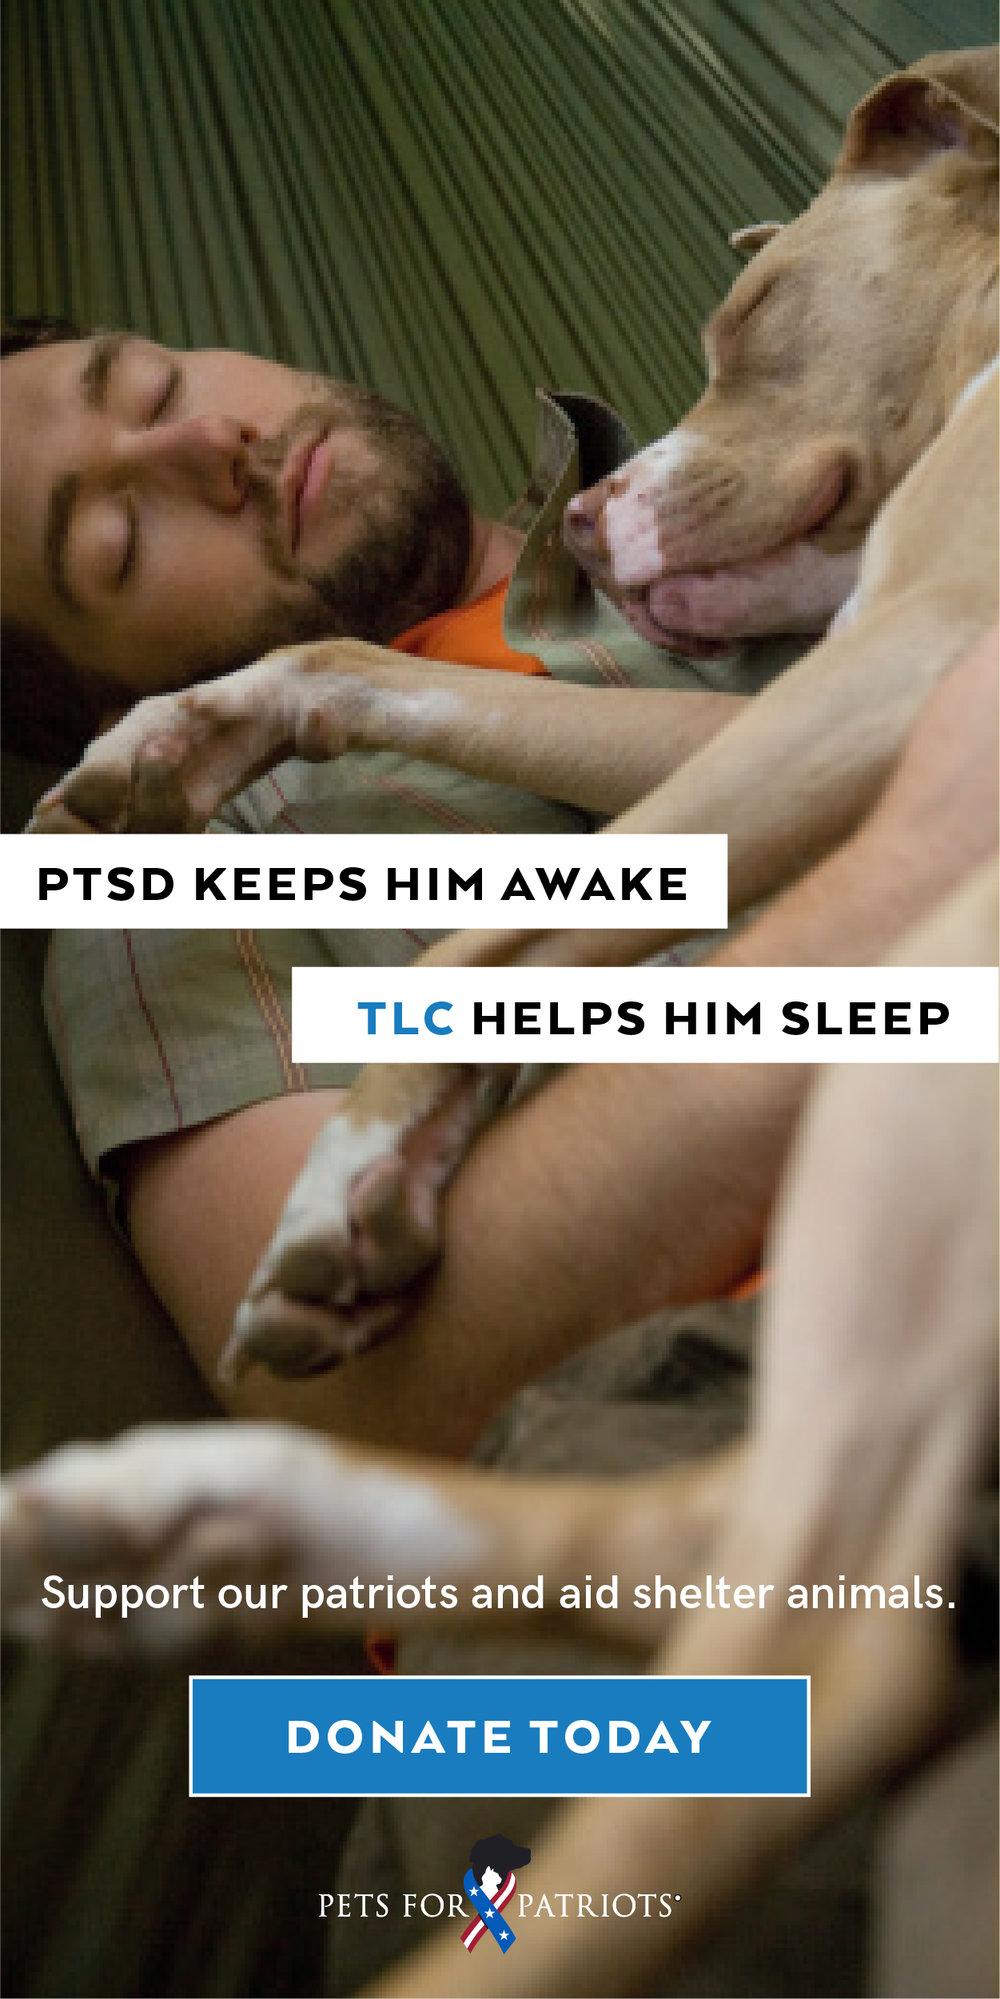 Tough&Cute_PTSD Vertical 2 copy 4.jpg